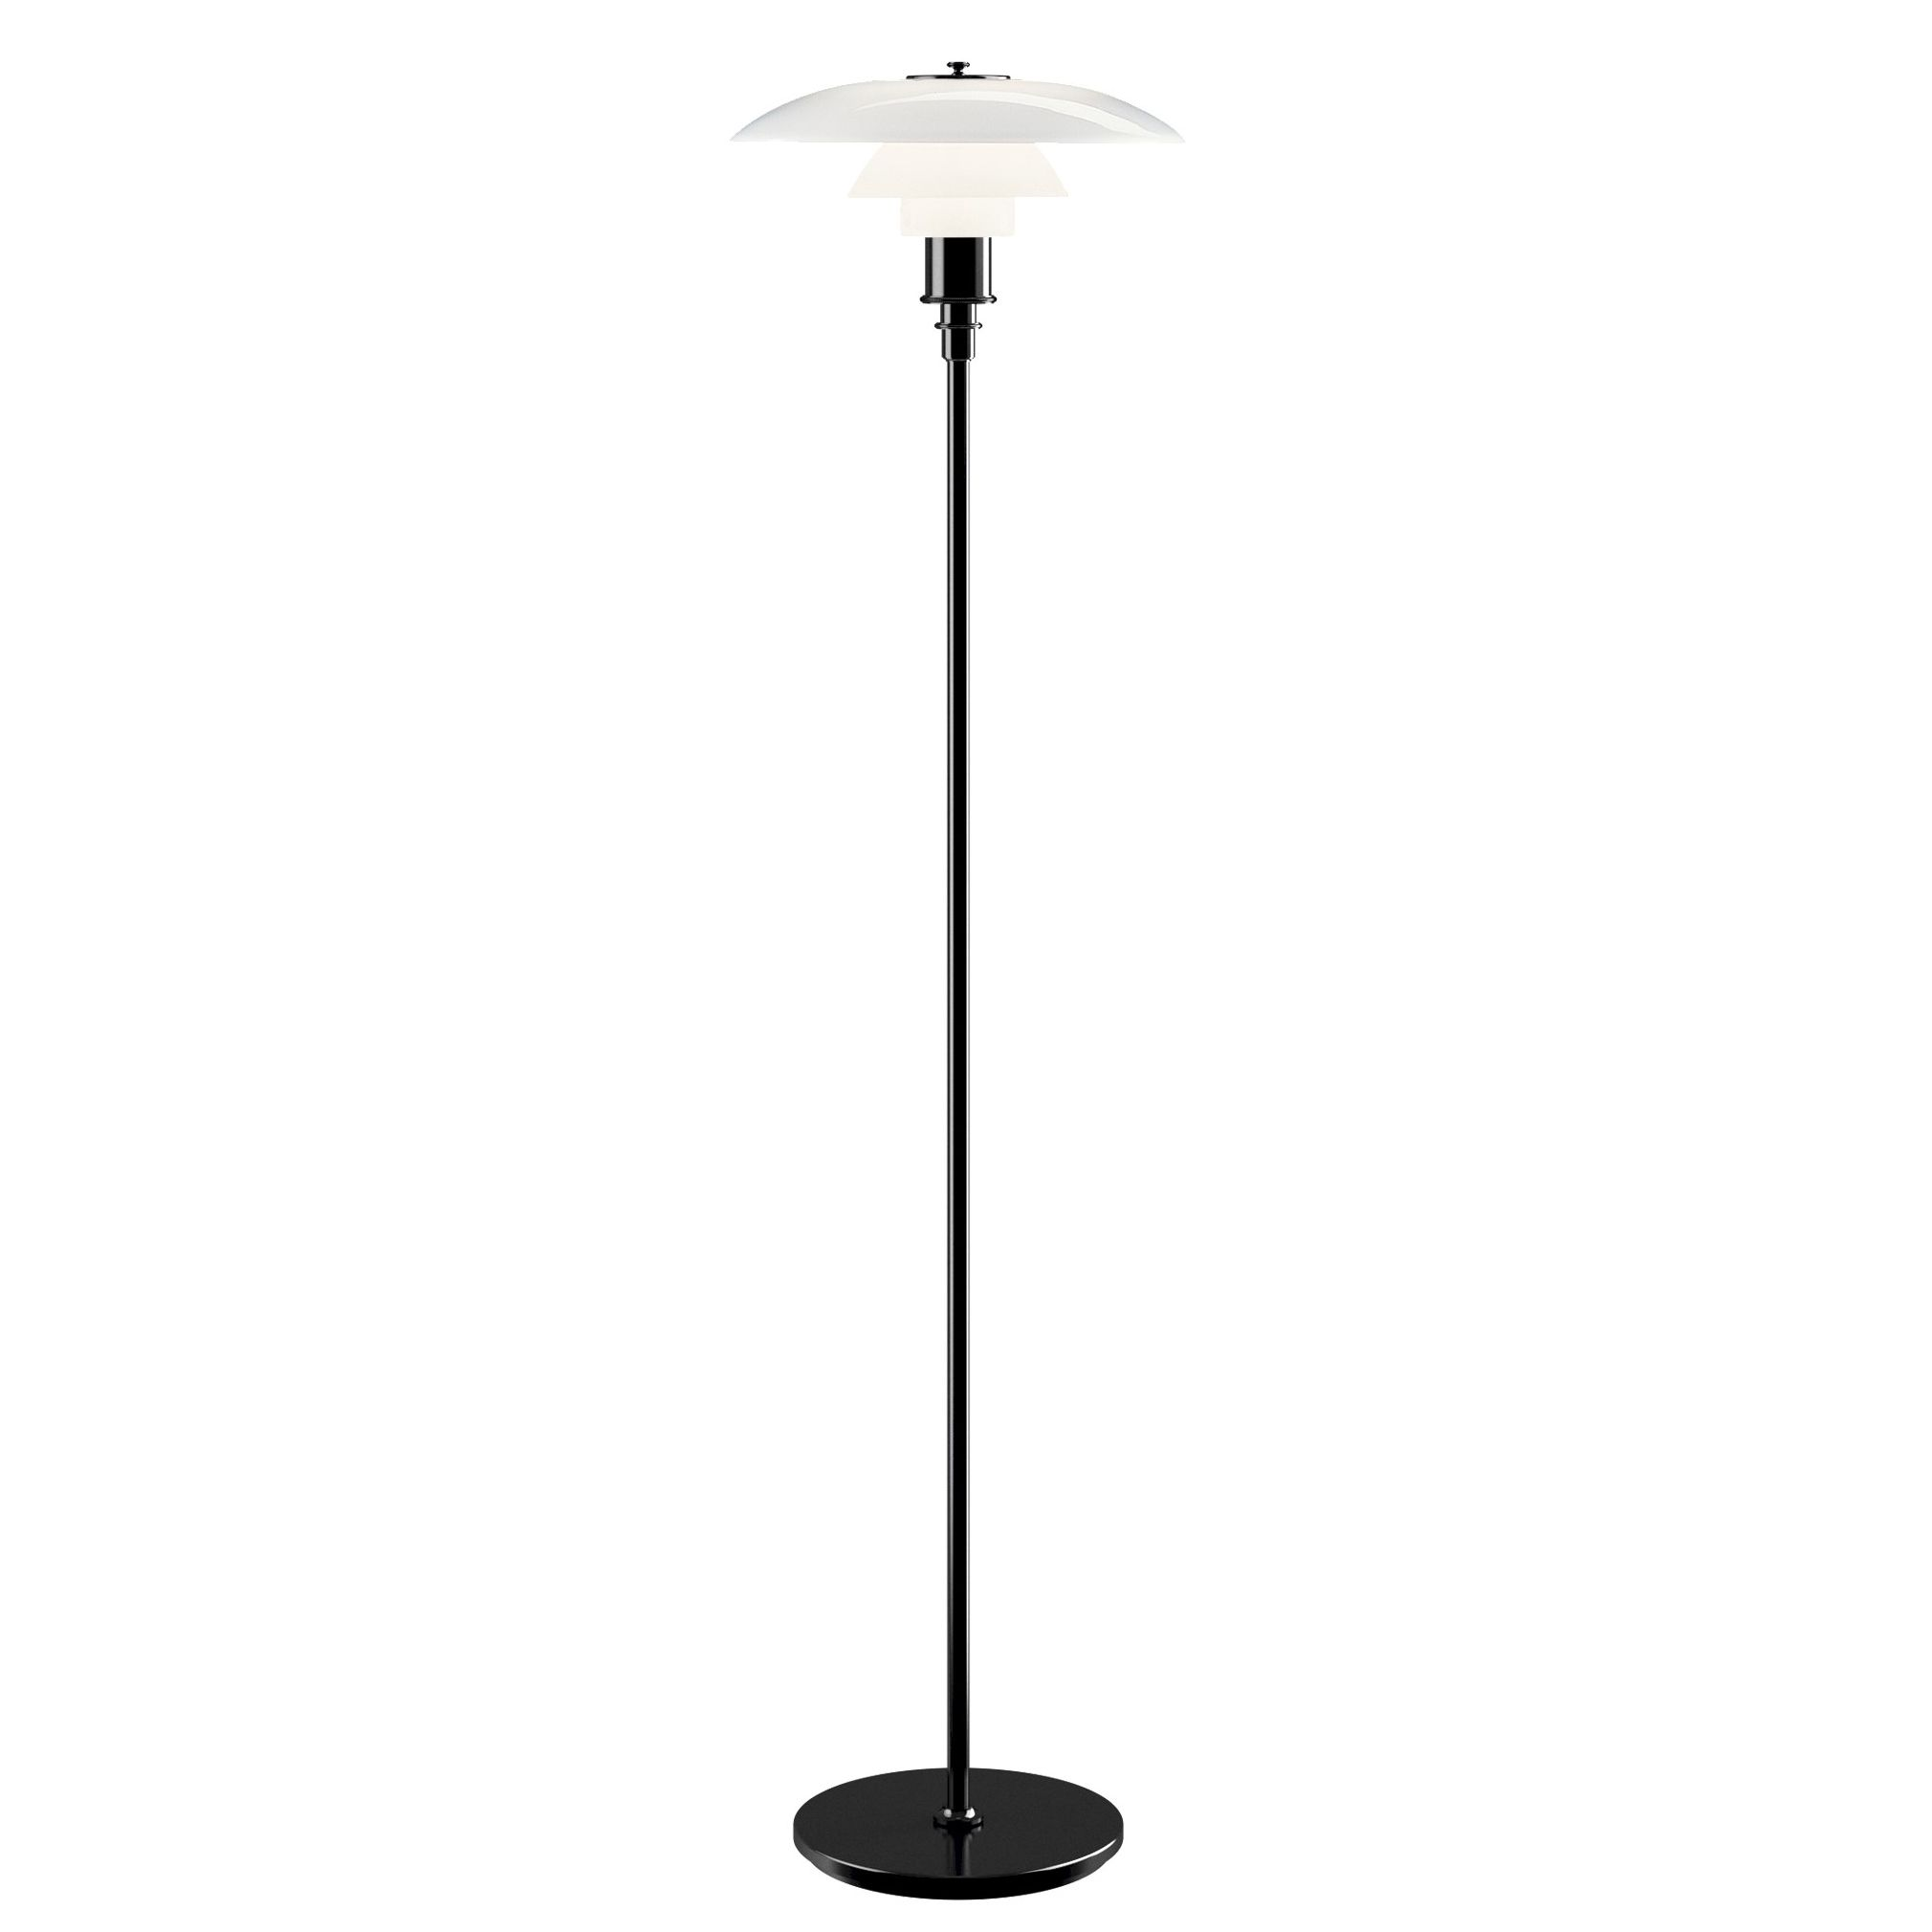 Louis Poulsen PH 3,5 2,5 vloerlamp zwart gemetaliseerd